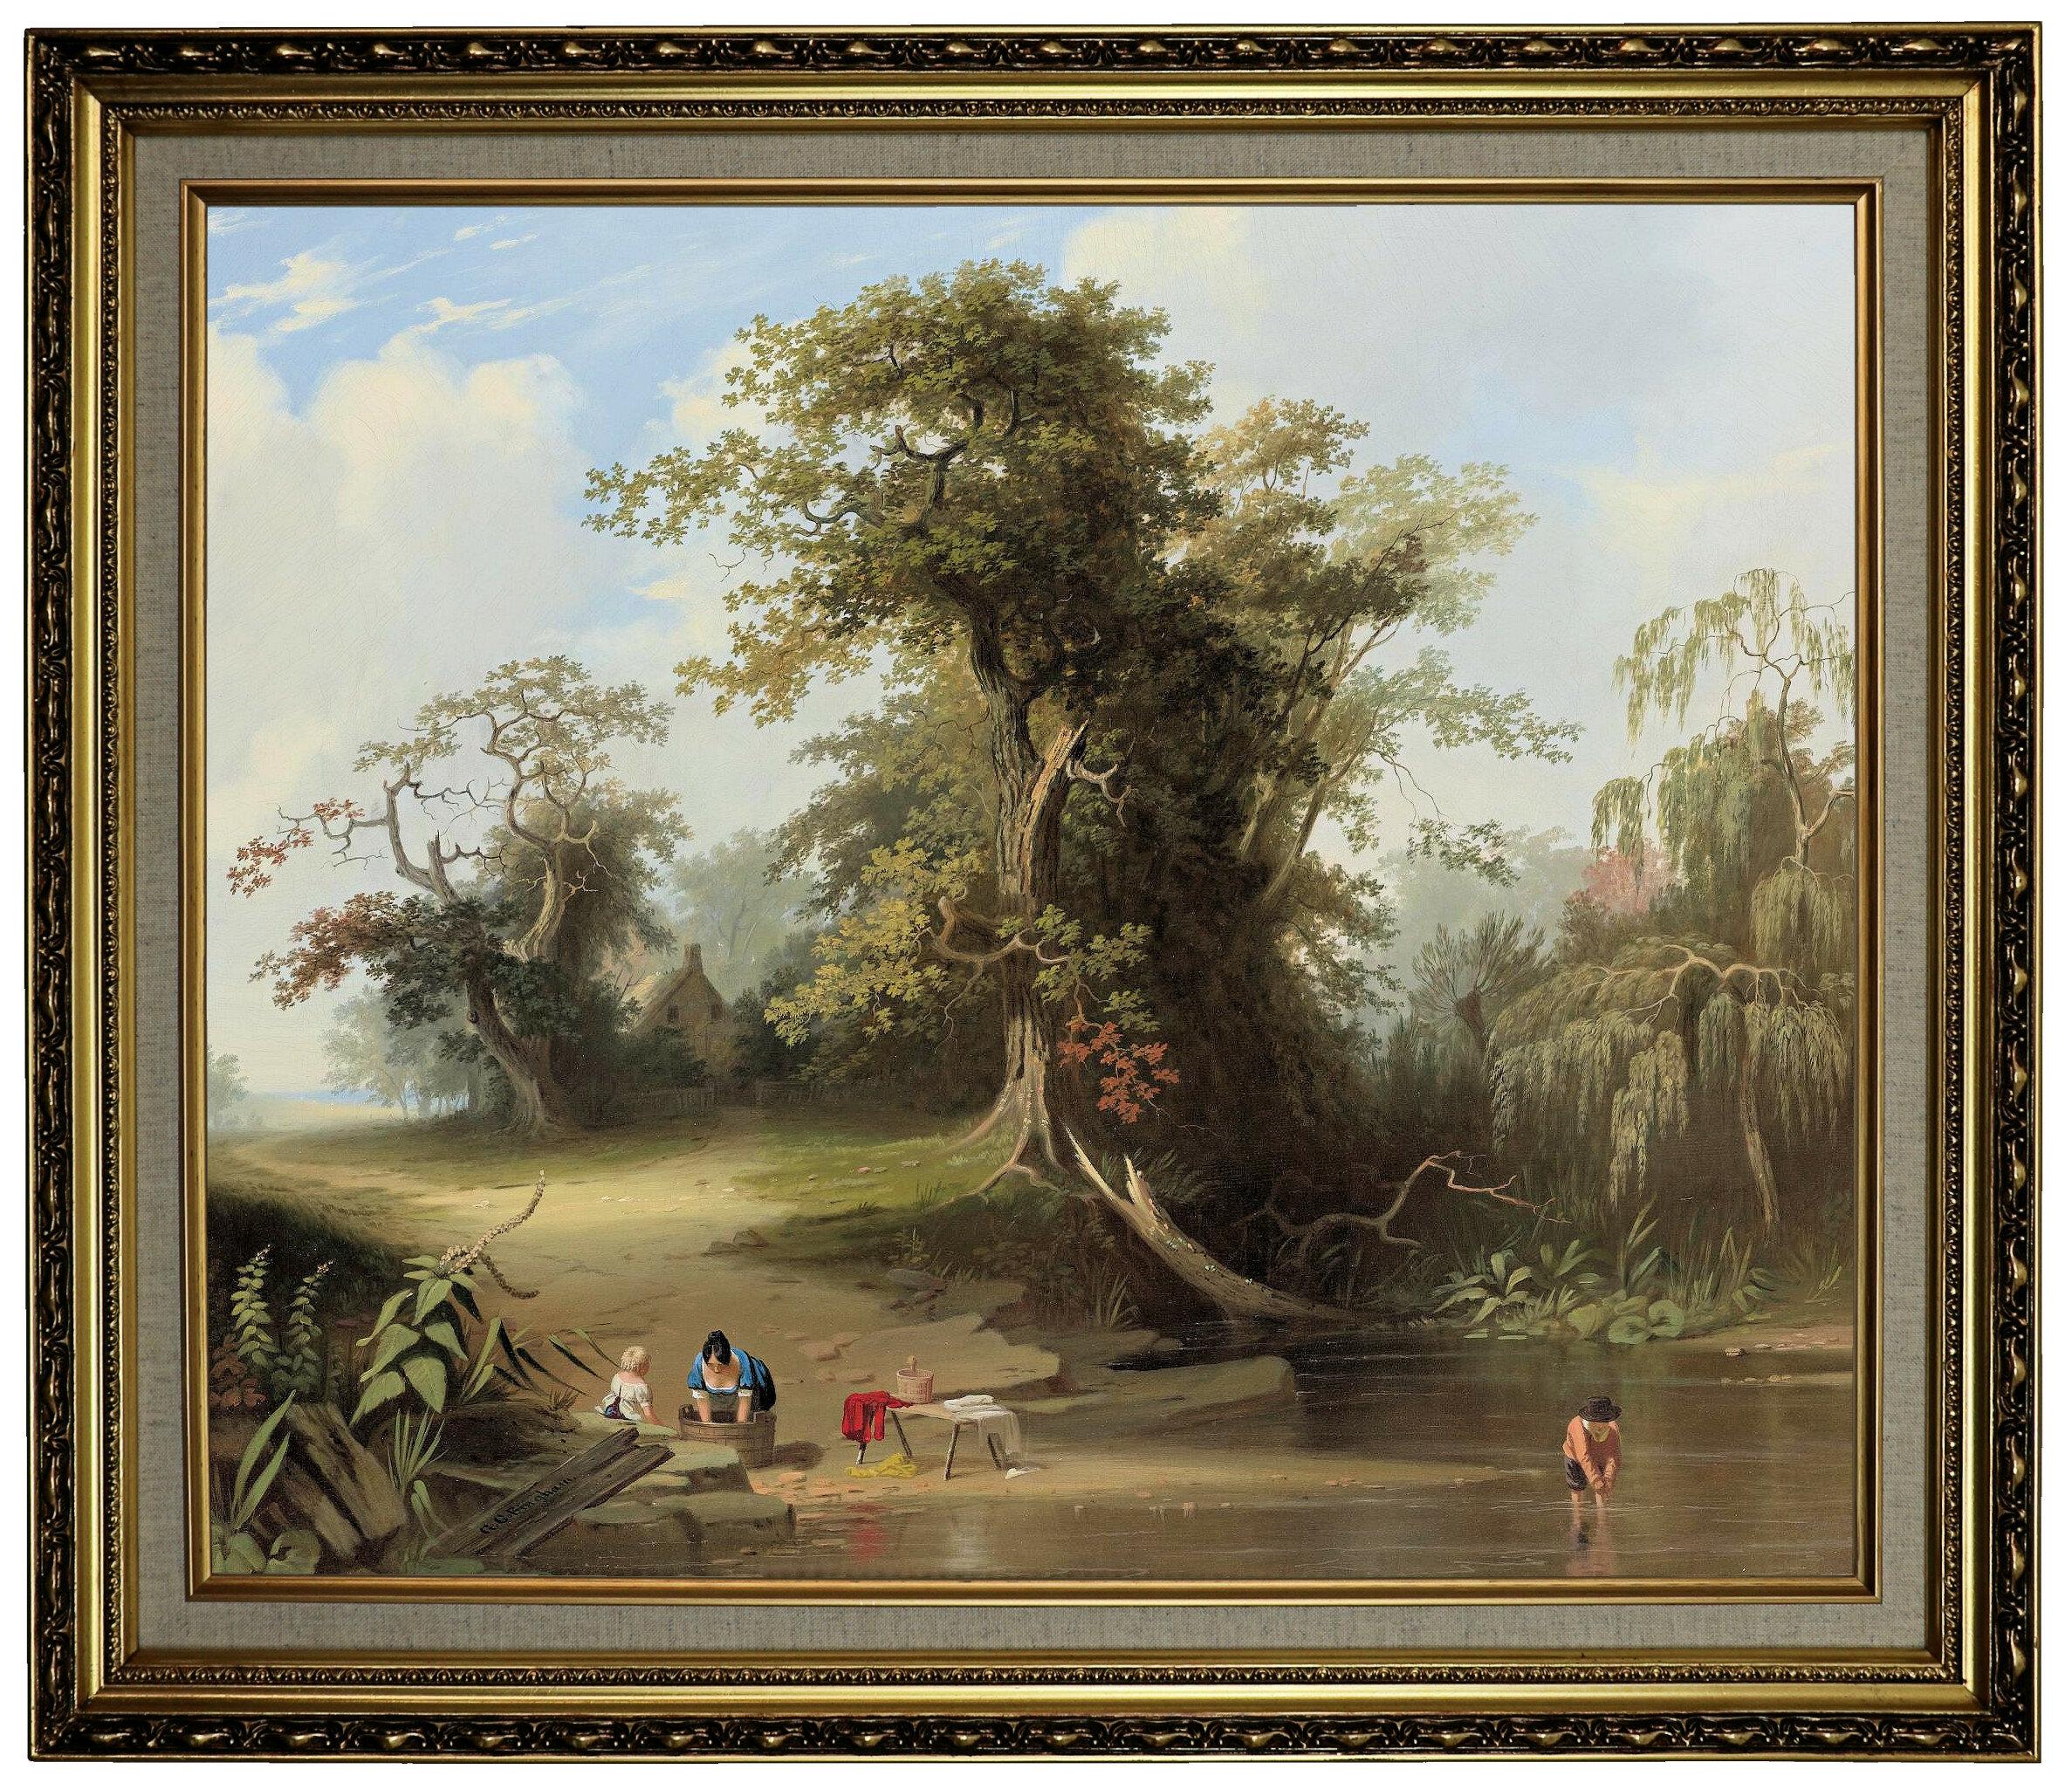 Astoria Grand Landscape Rural Scene 1845 Framed Oil Painting Print On Canvas Wayfair